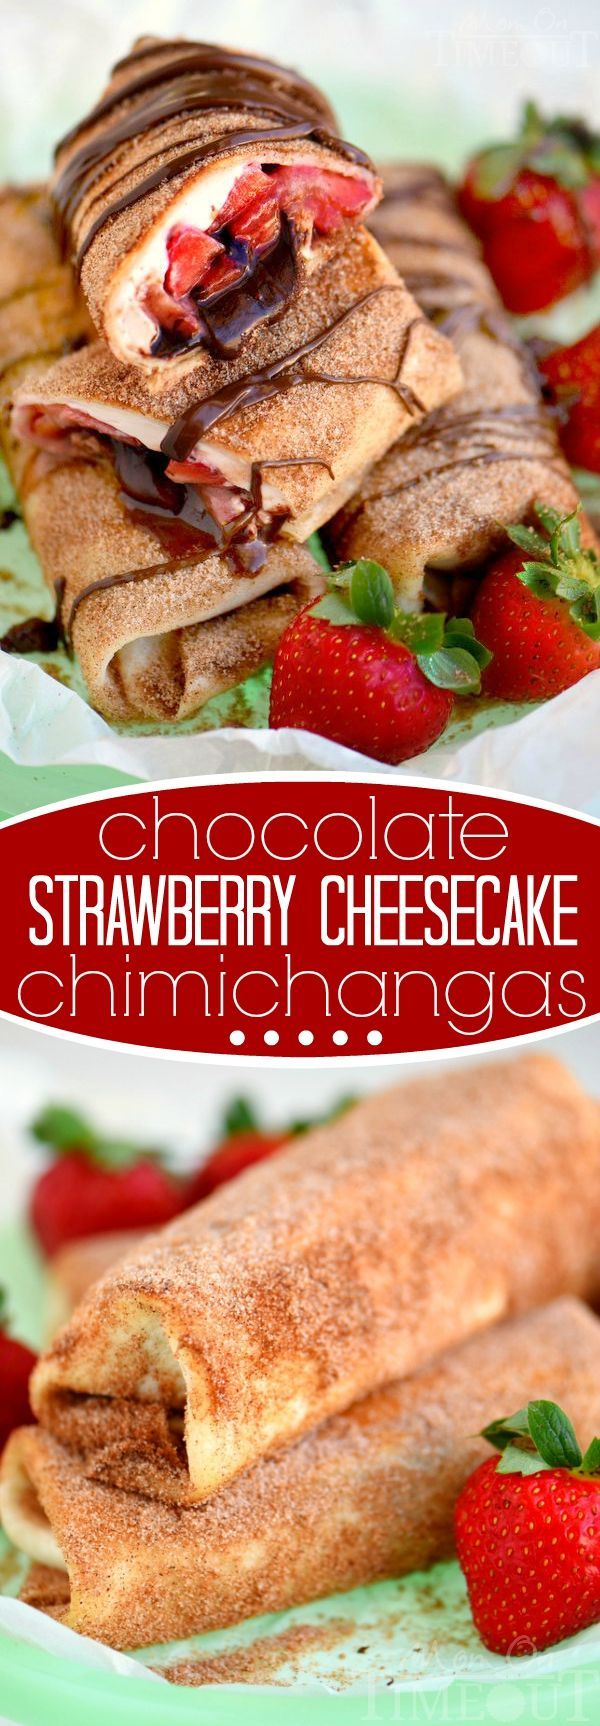 Chocolate Strawberry Cheesecake Chimichangas on http://MyRecipeMagic.com